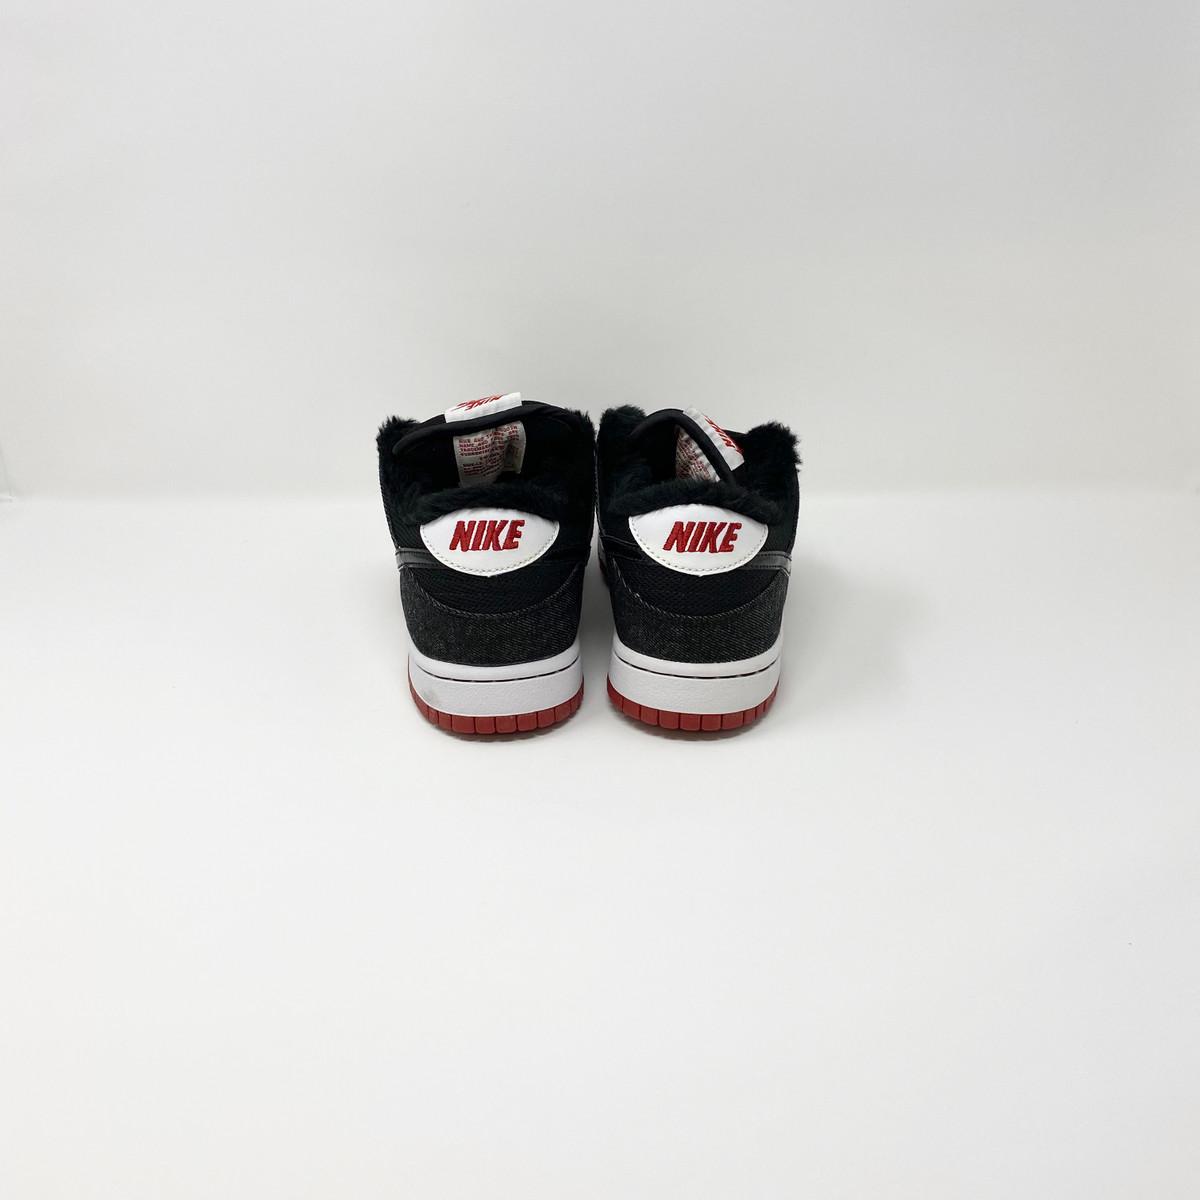 Nike Dunk Low Prem SB Larry Perkins